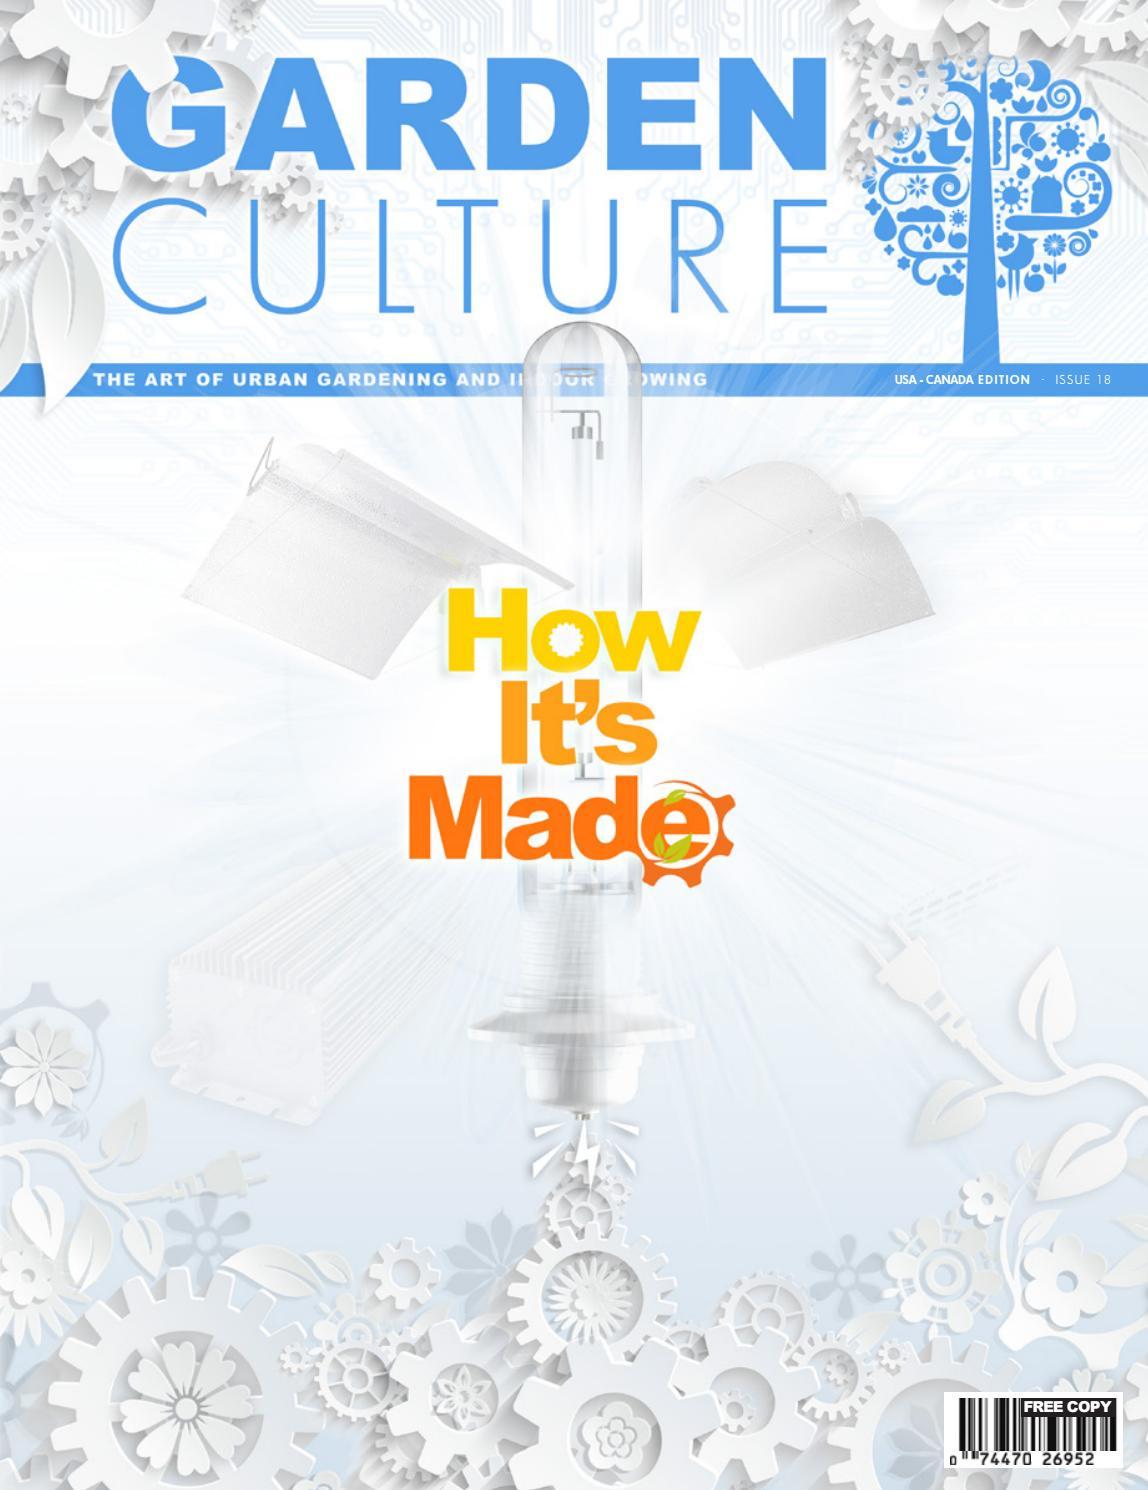 Garden Culture Magazine Us 18 By Issuu Power Probe Short Circuit Detector Kit Pricefallscom